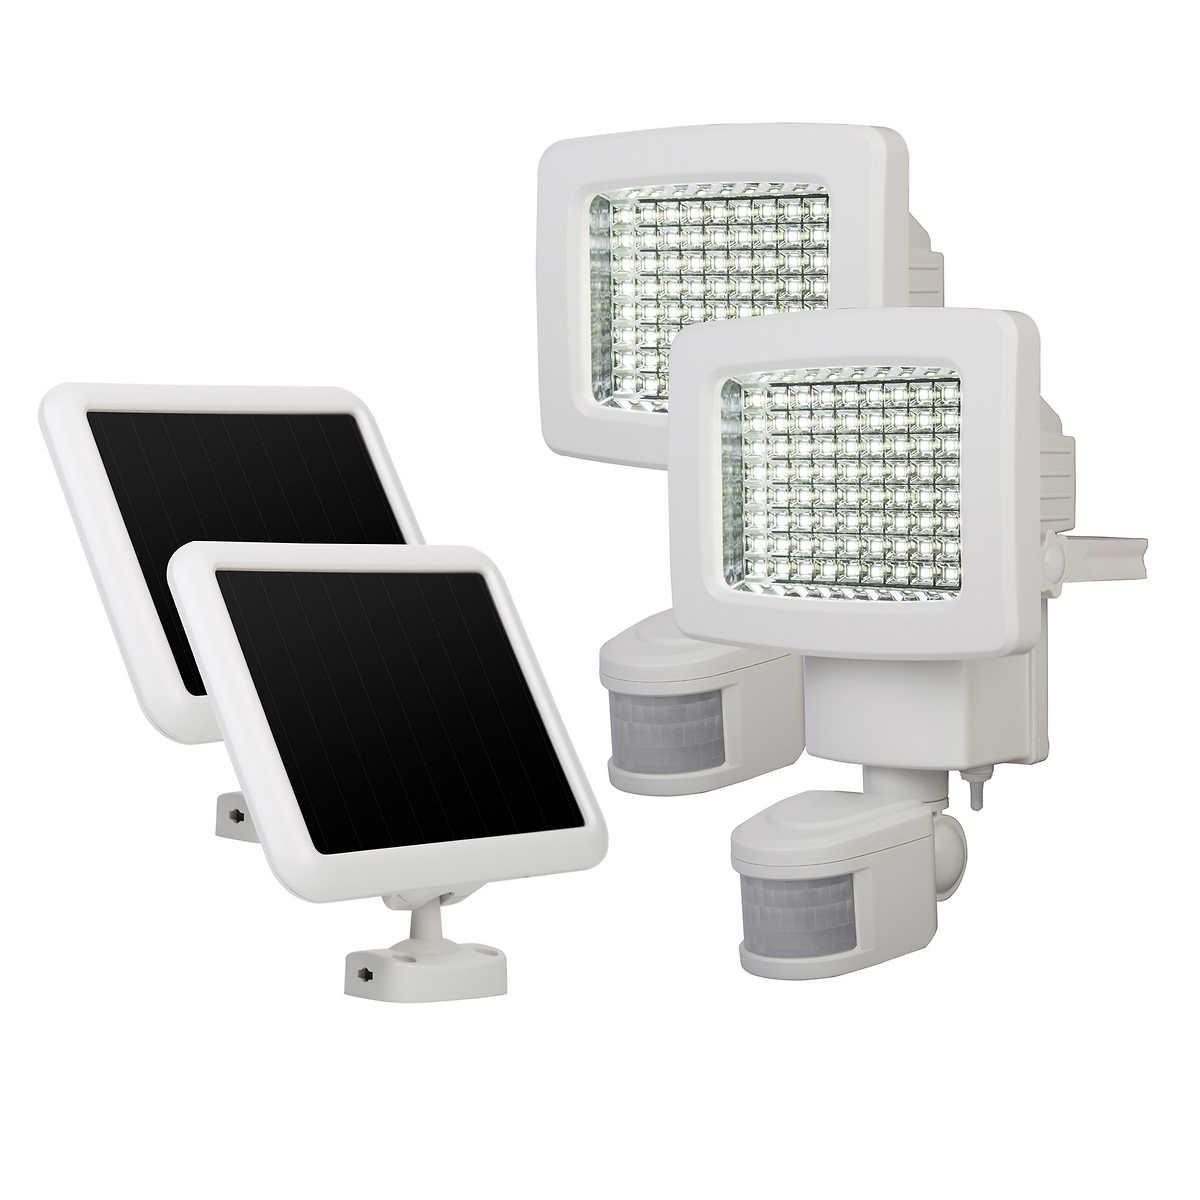 Solar patio lights costco - Sunforce Solar Motion Light 2 Pack